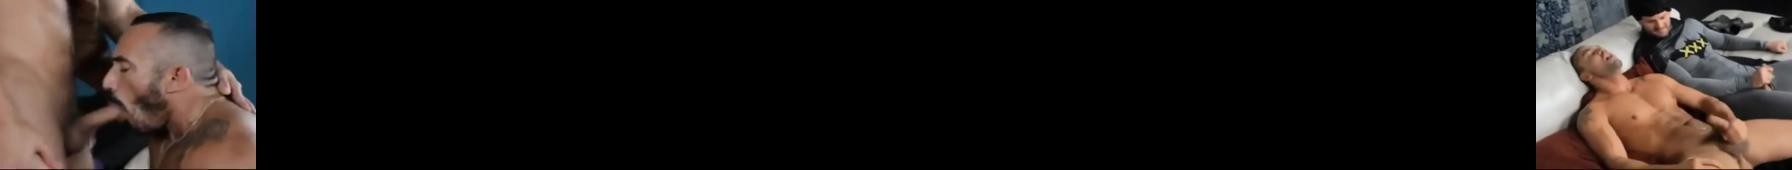 Przygody batmana i robina